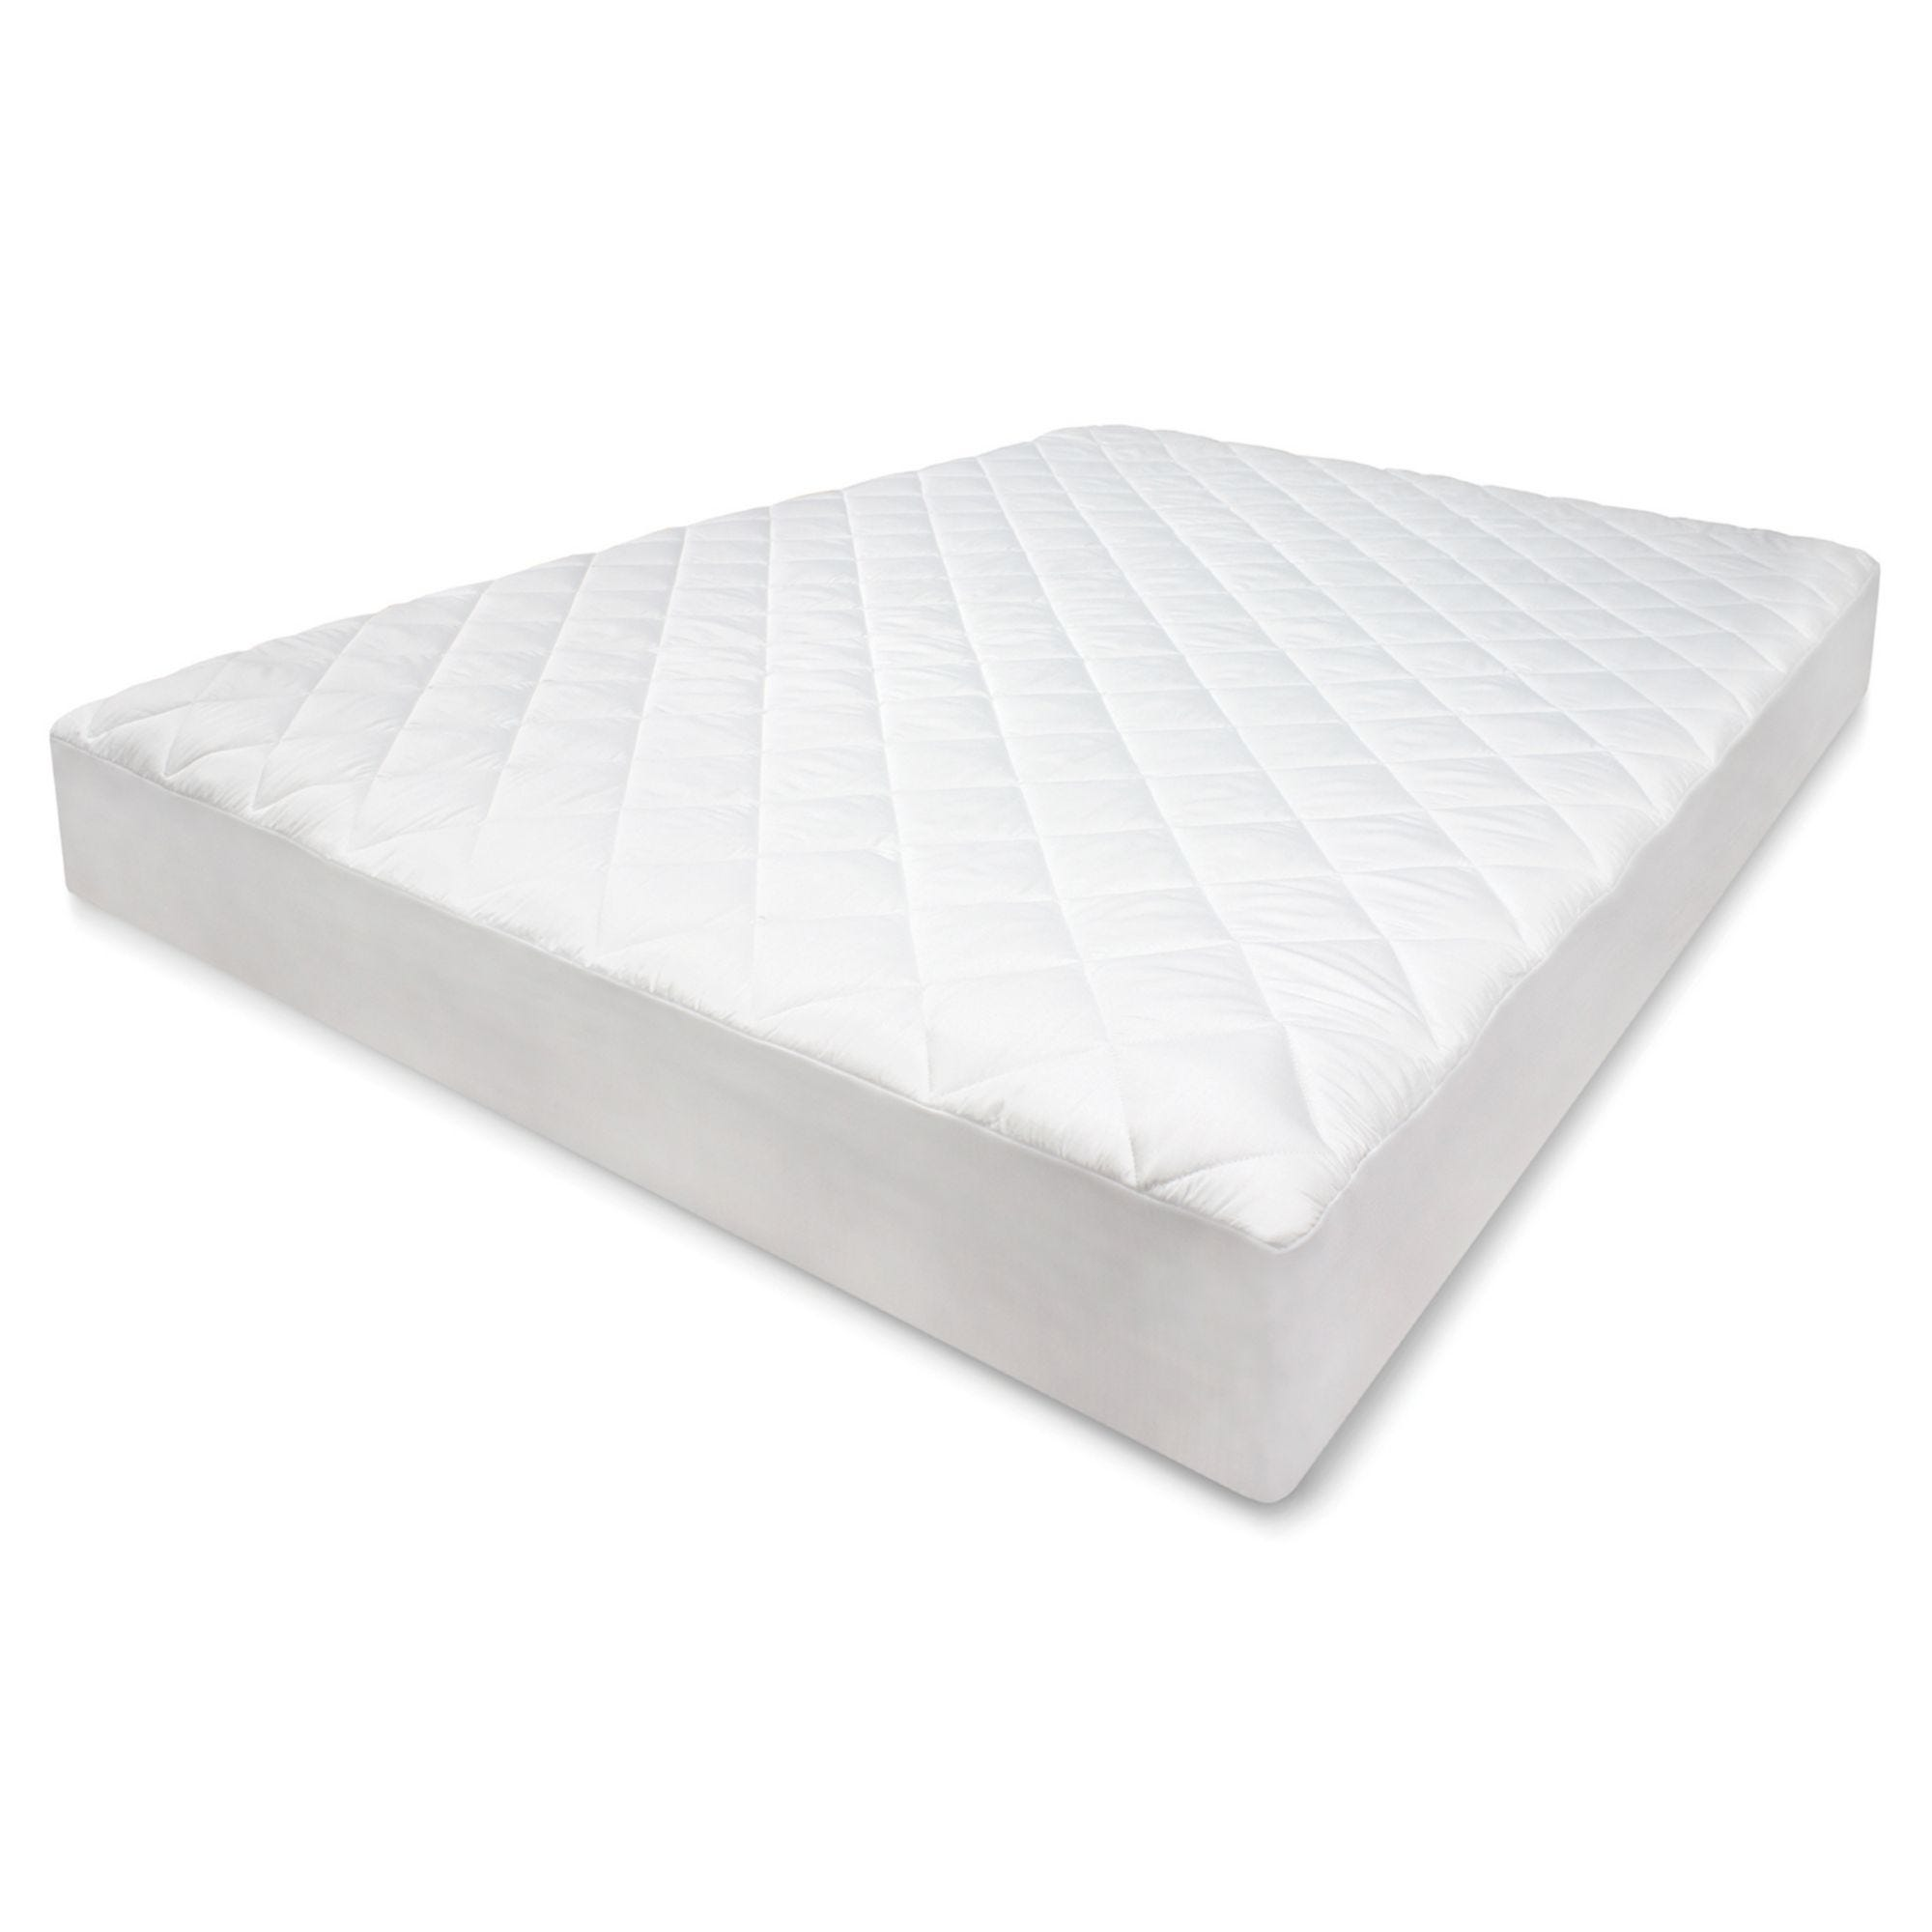 dynasty corsicana world mattress sleep platinum top moores bedding pillow carraway